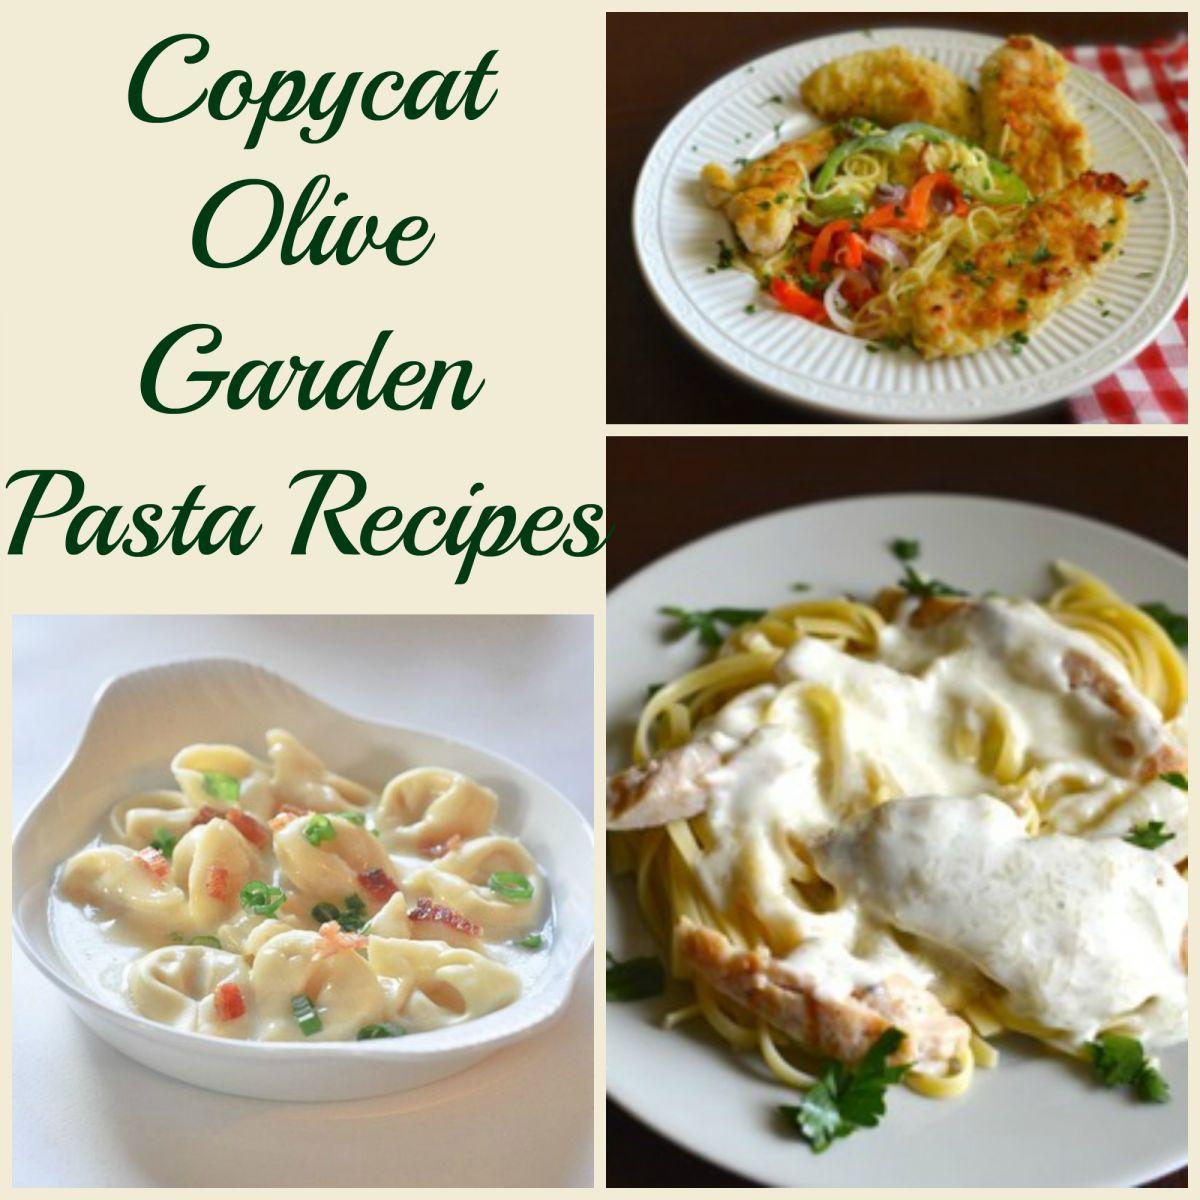 10 Copycat Olive Garden Pasta Recipes.